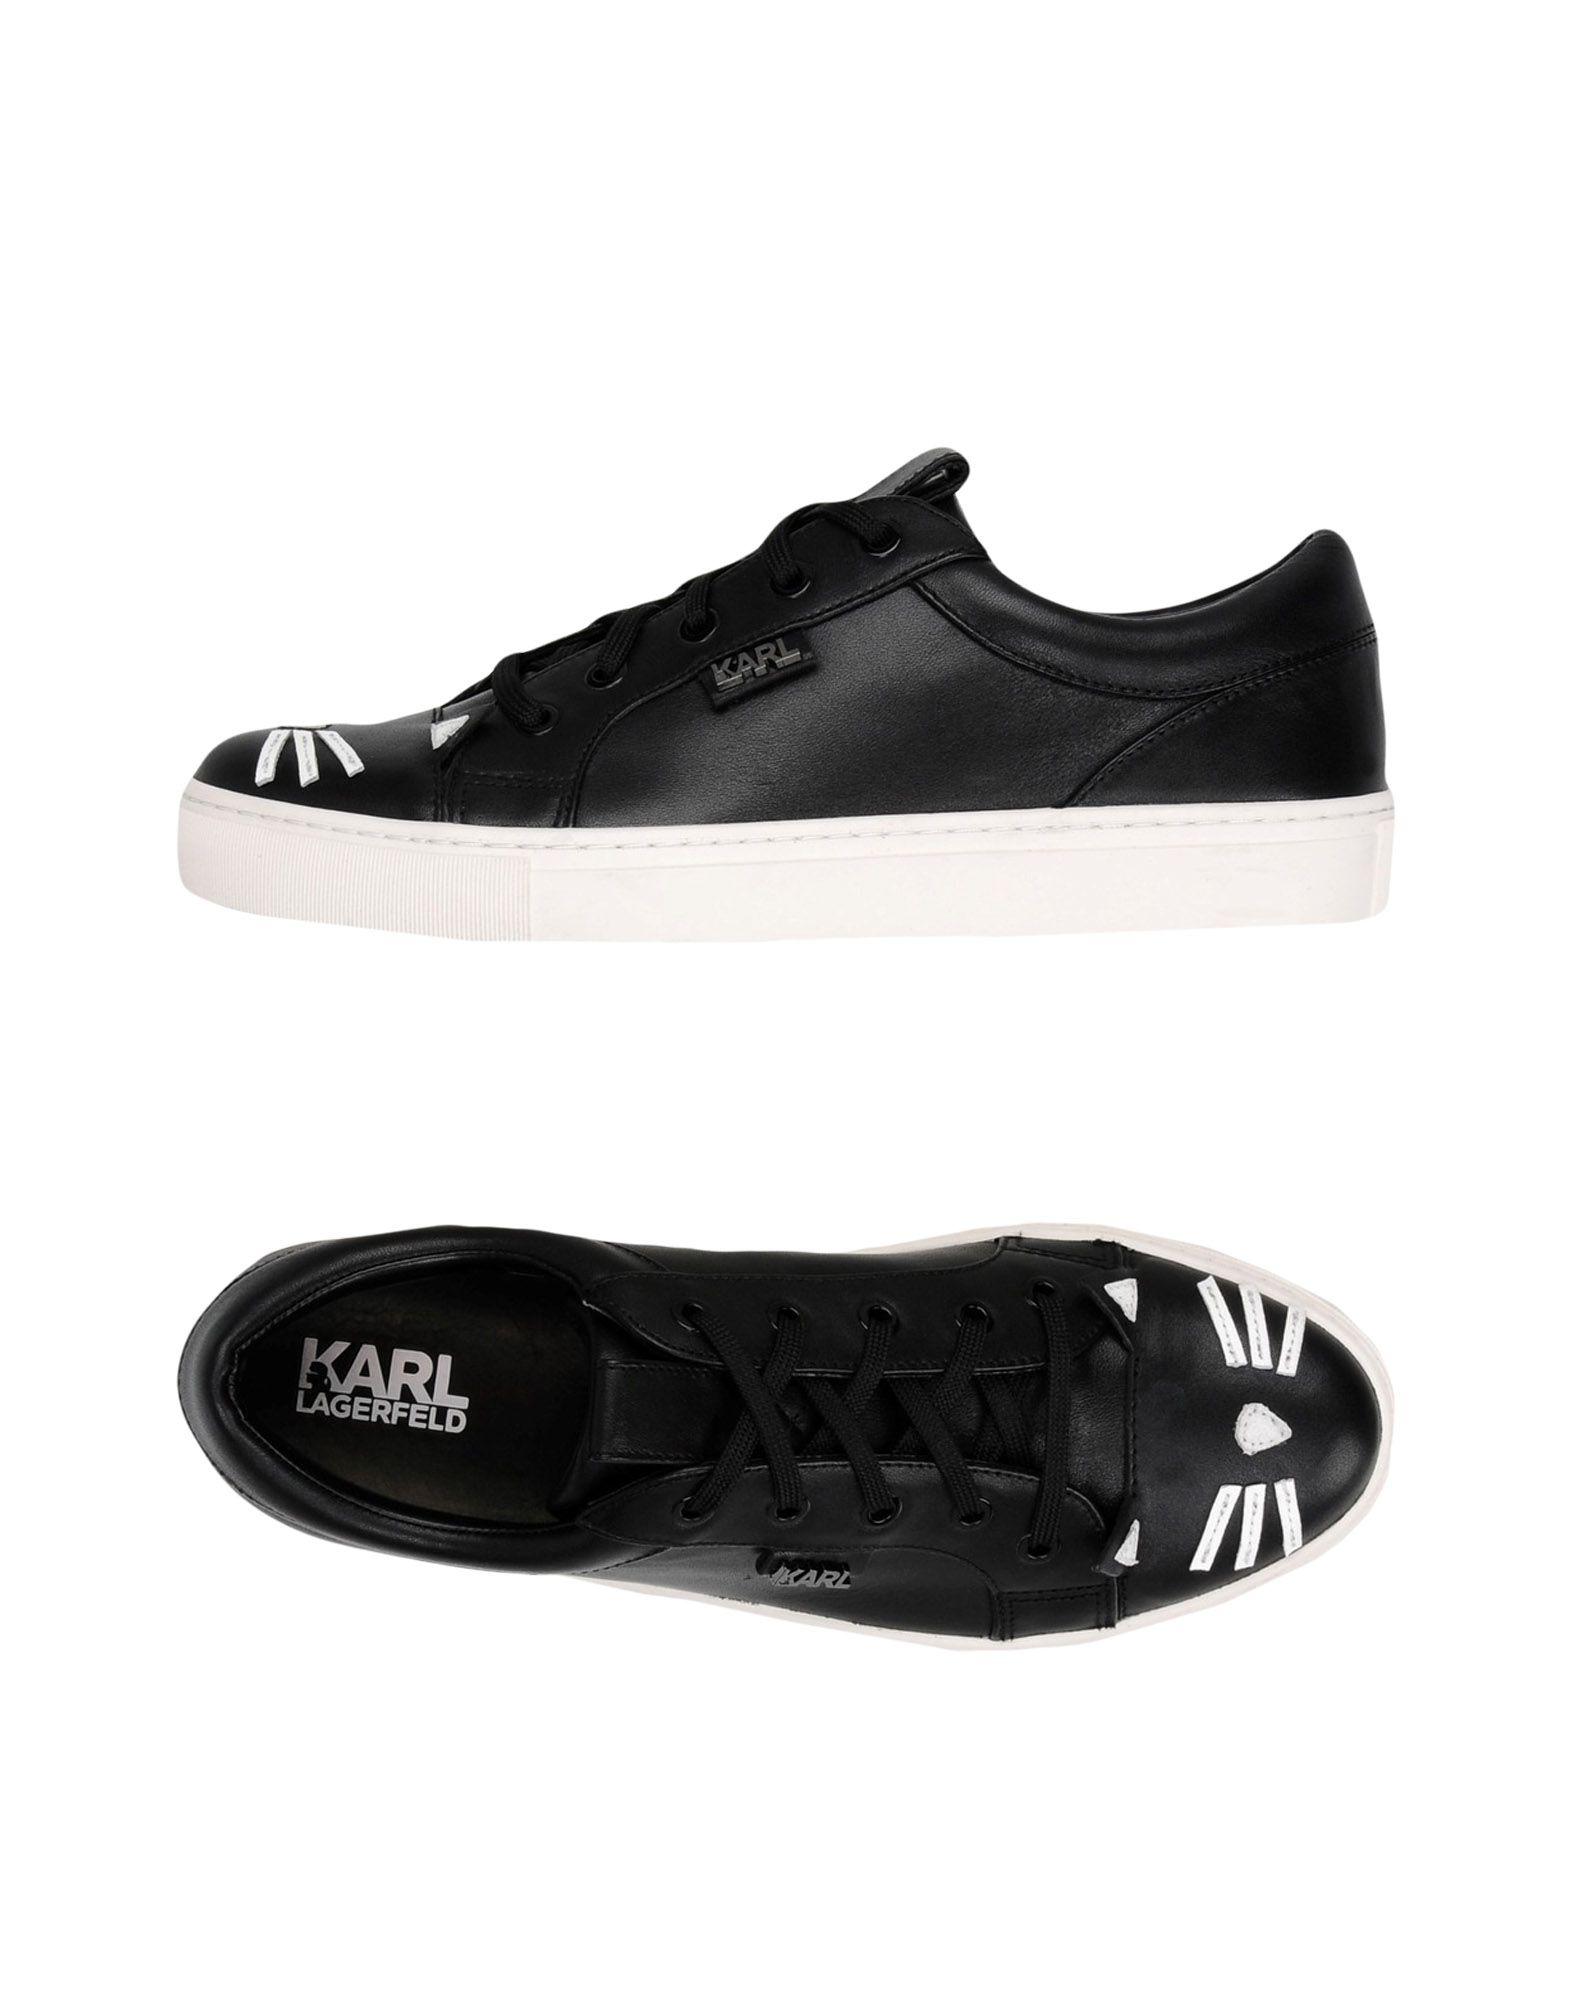 Karl Lagerfeld Kupsole Choupette Toe Lace  11423996FMGut aussehende strapazierfähige Schuhe